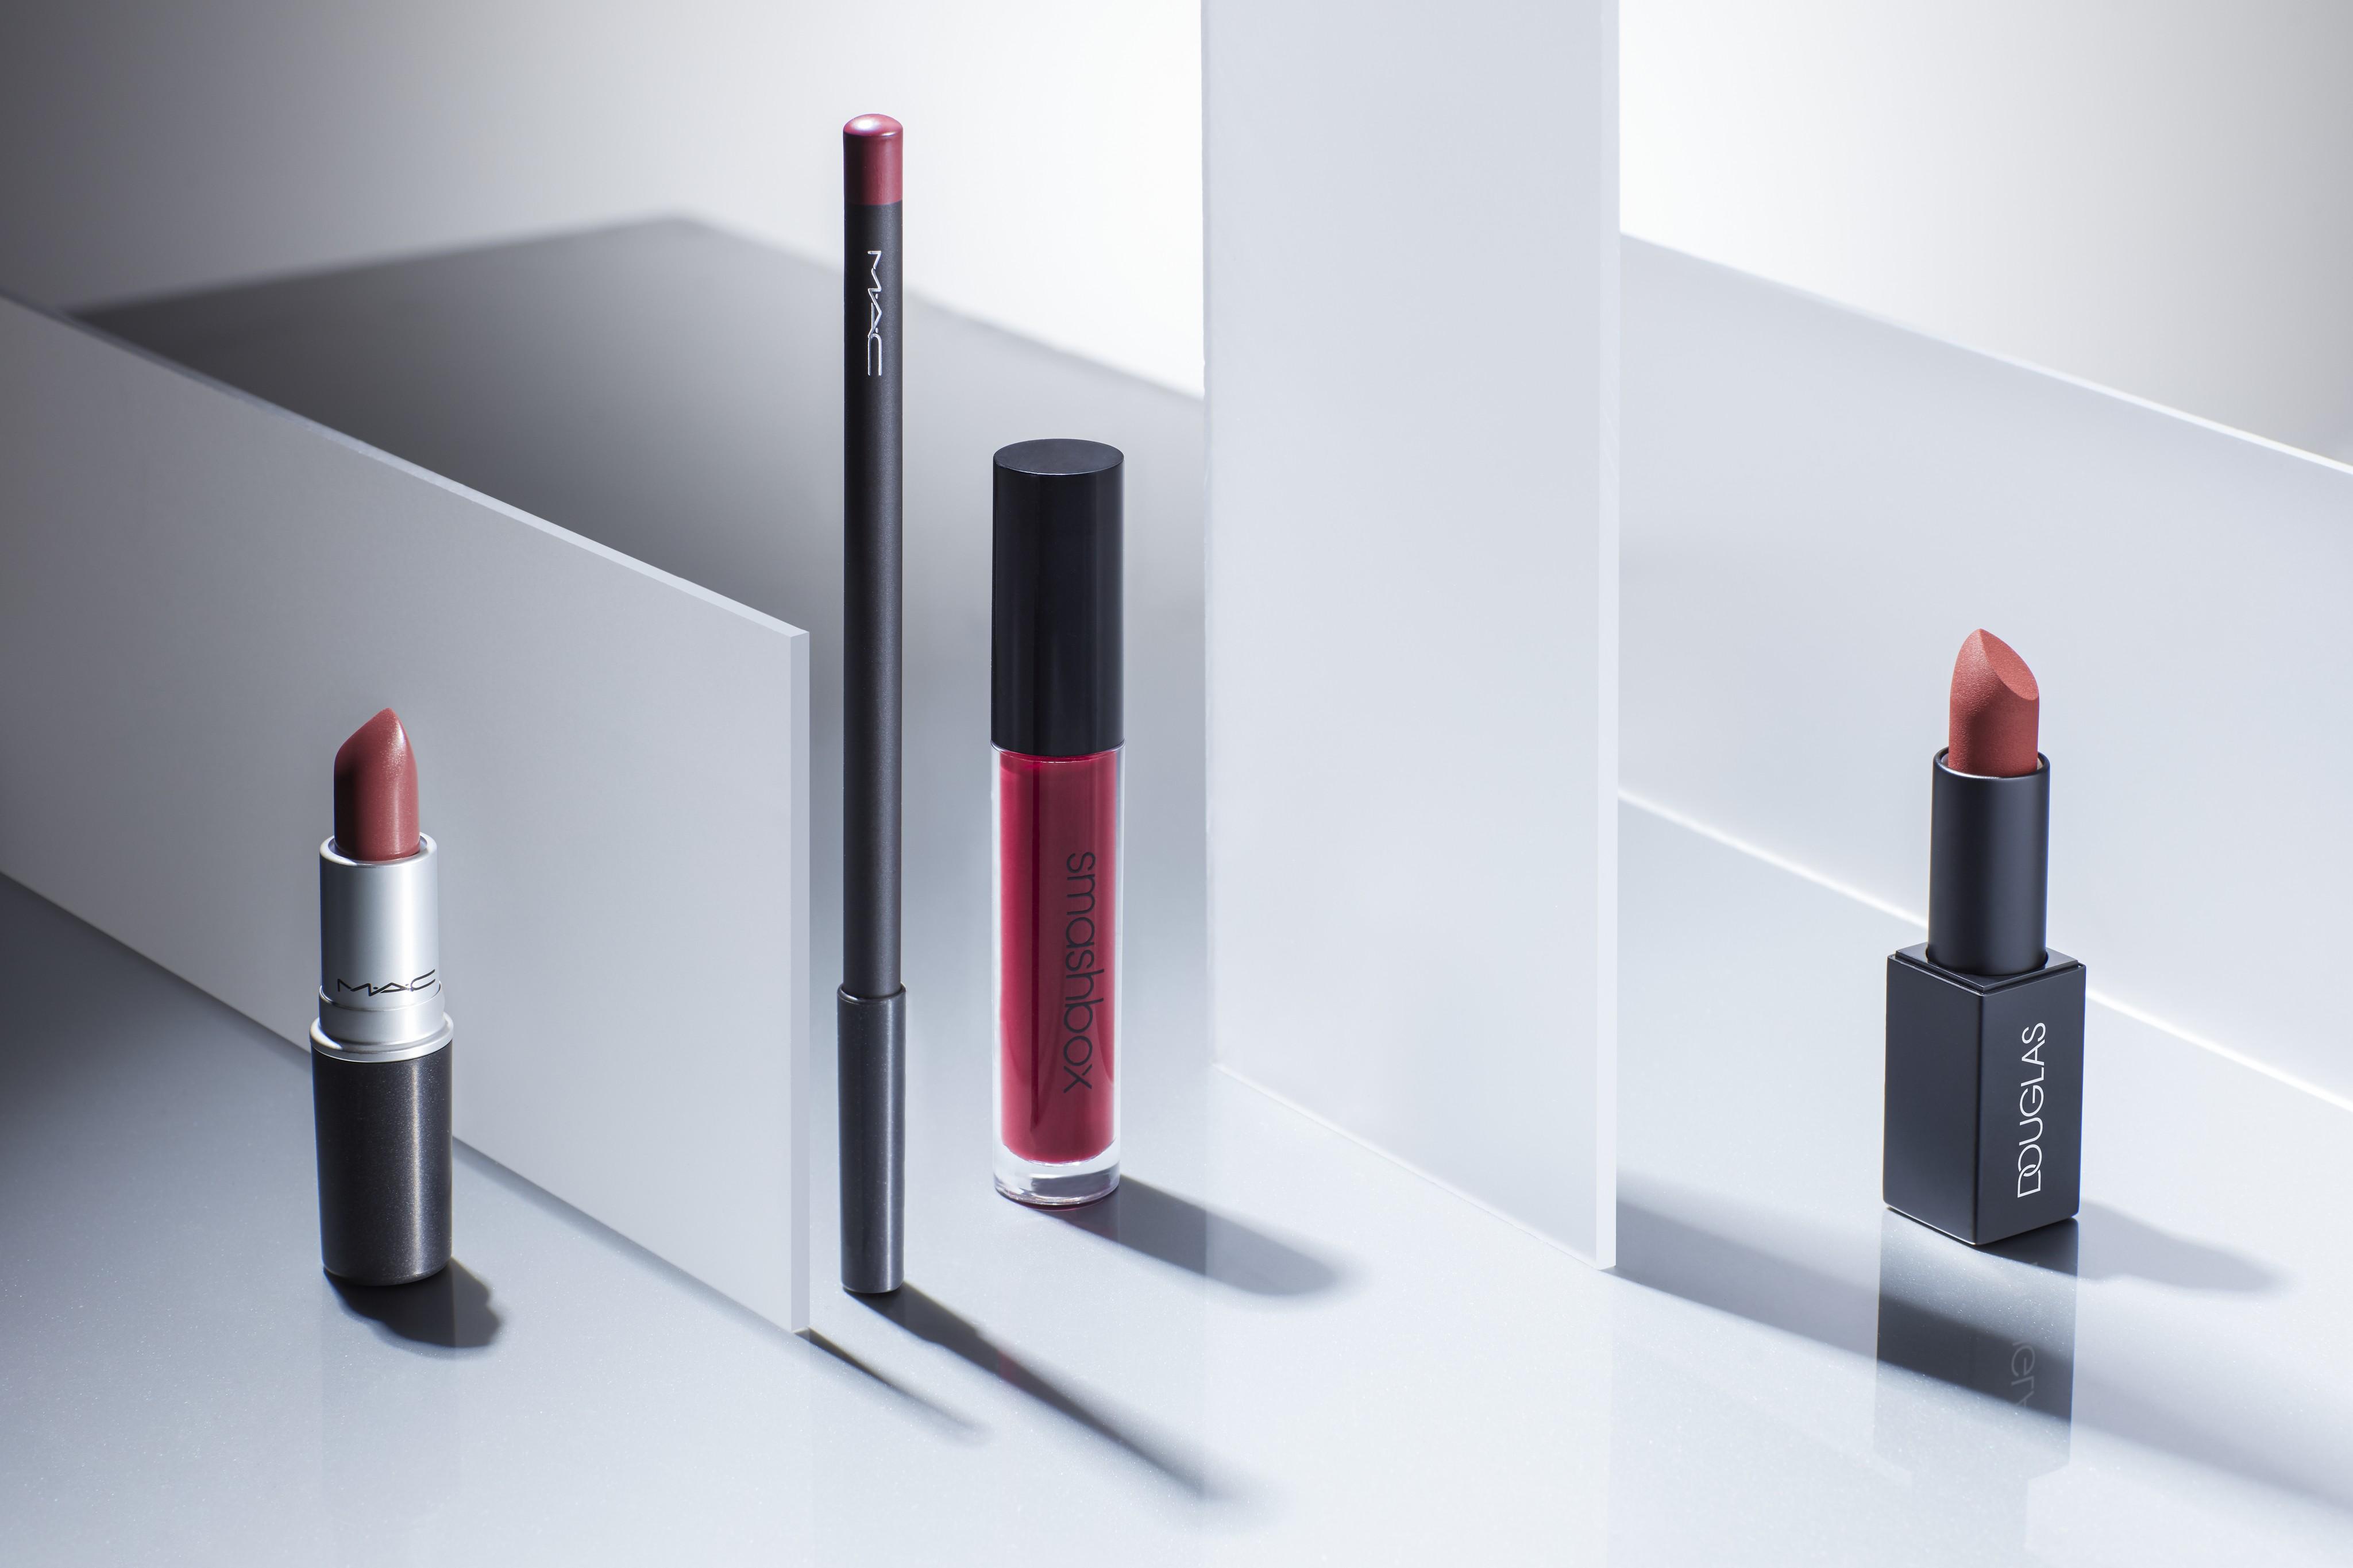 Makeup-product-vitamin-e-milky-glass-plates-douglas-mac-smashbox-unlimited-Web-Rendition